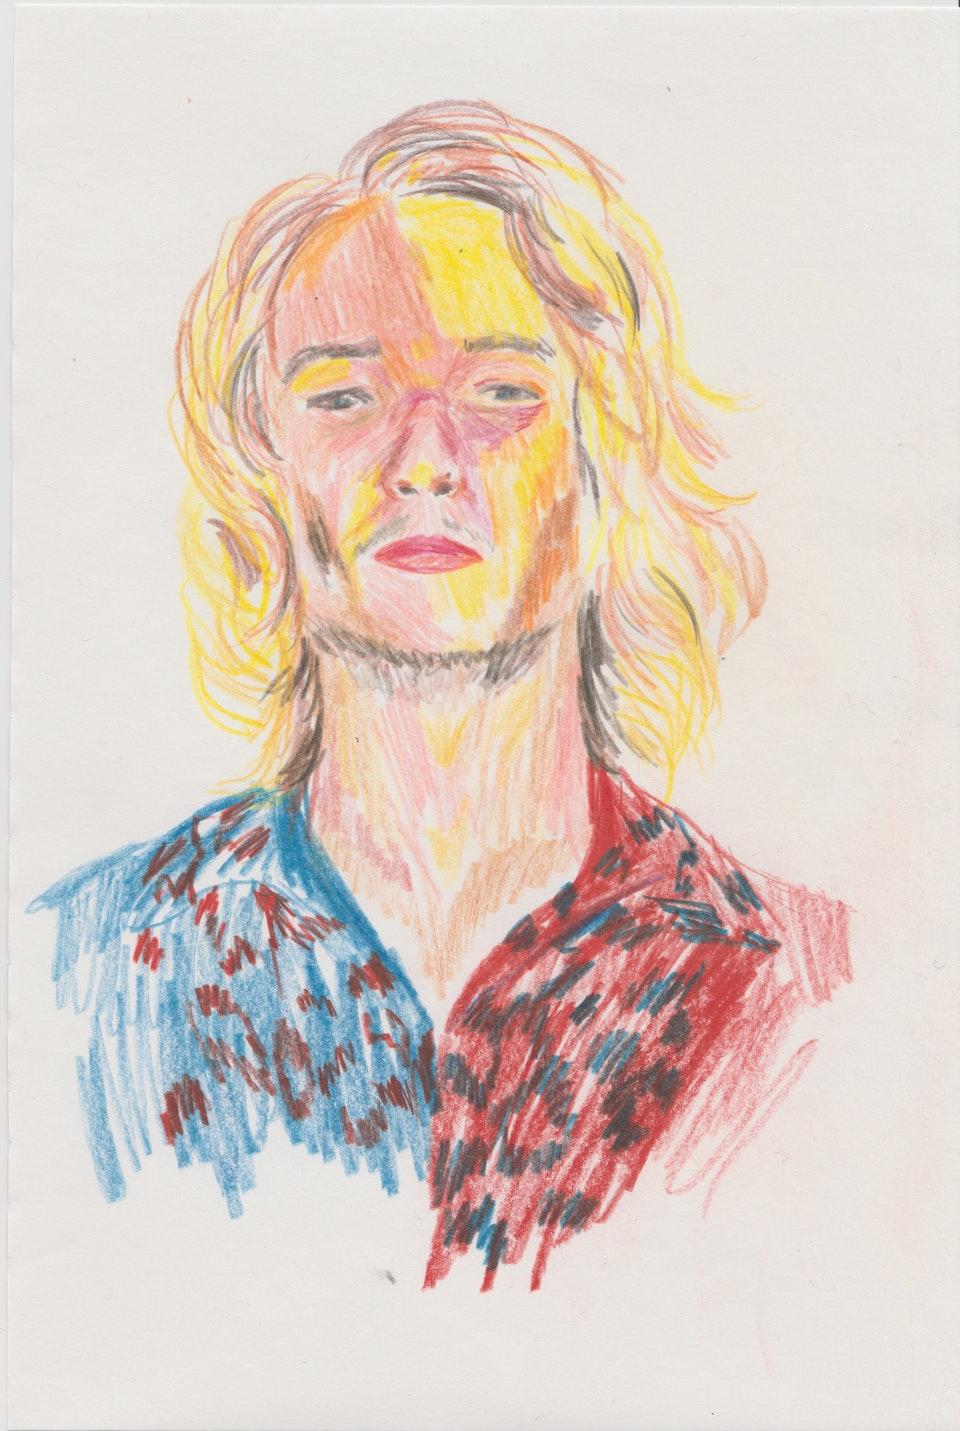 Portraits - Orlando - 2020 - Pencil on Paper - 21 x 29 cm A4